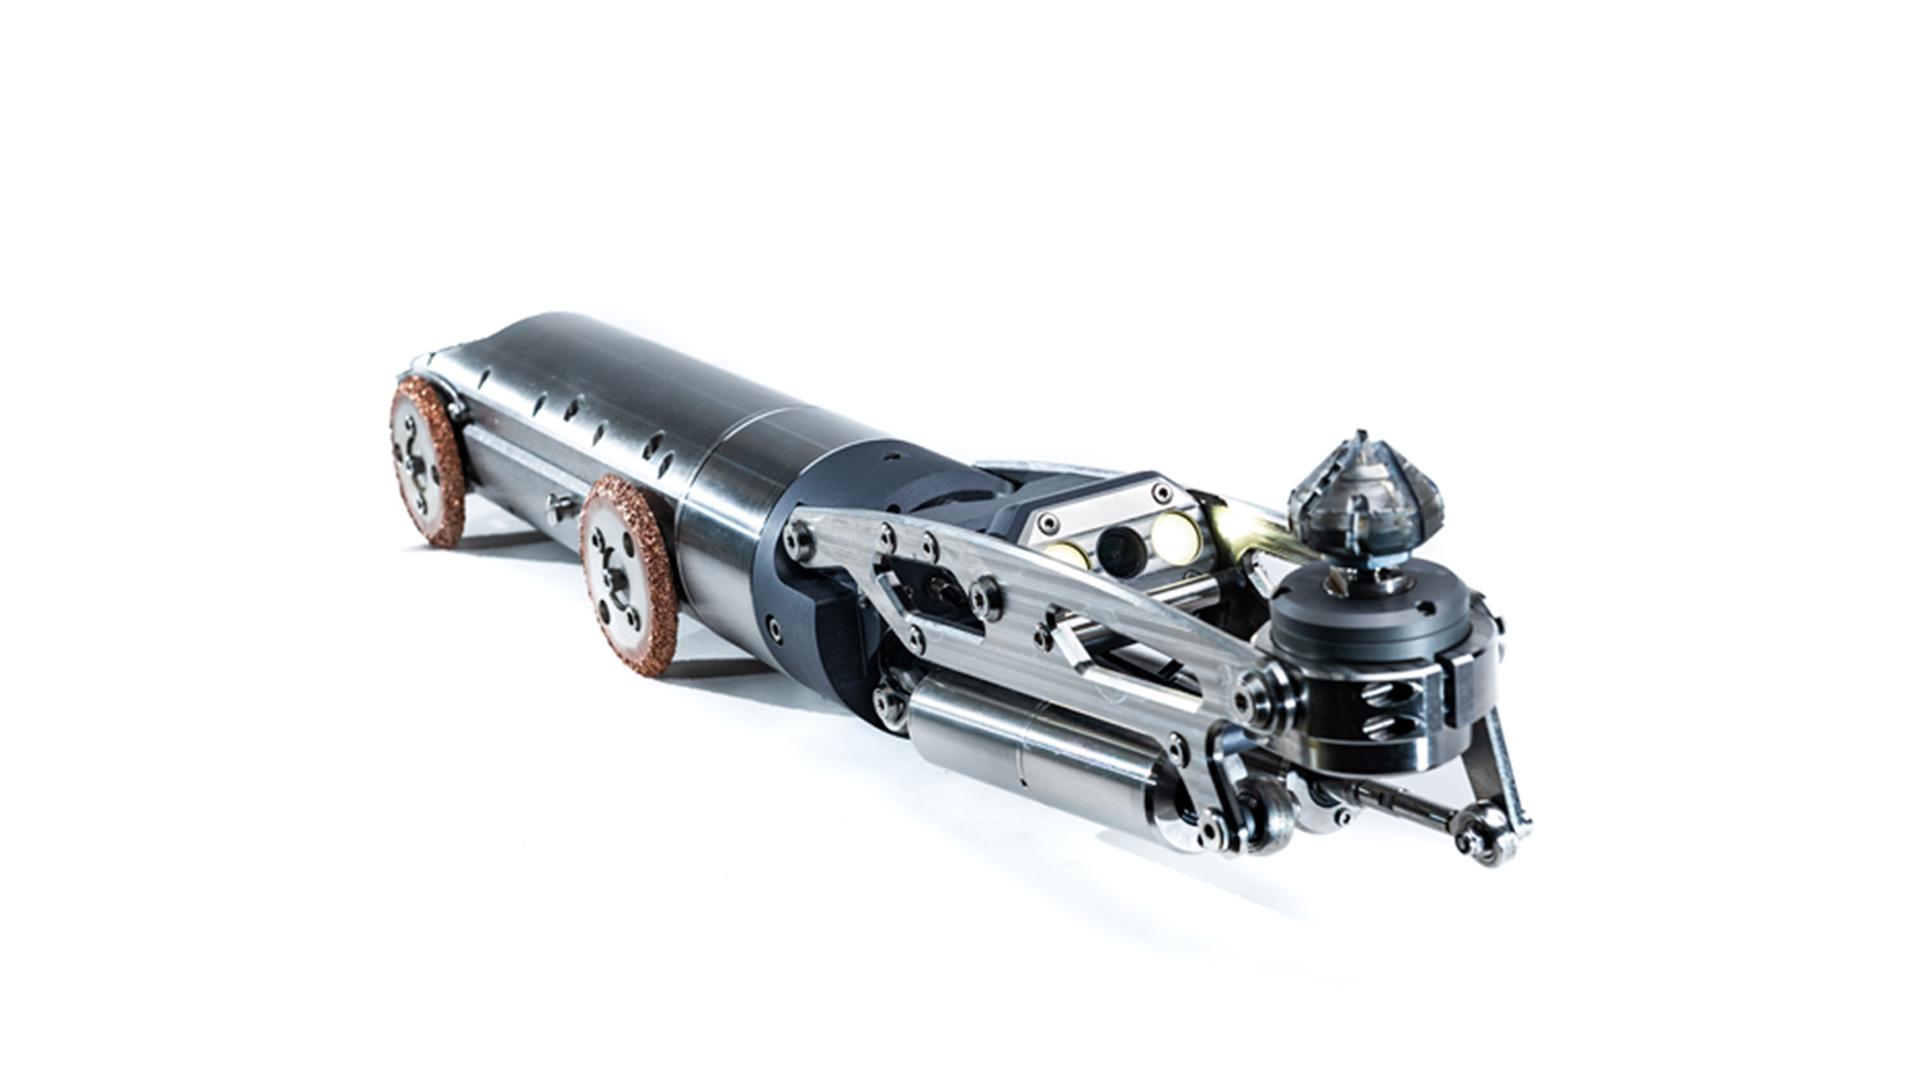 Gallery image 3 - Sewer Robotics - HA125 Lateral Reinstatement Cutter